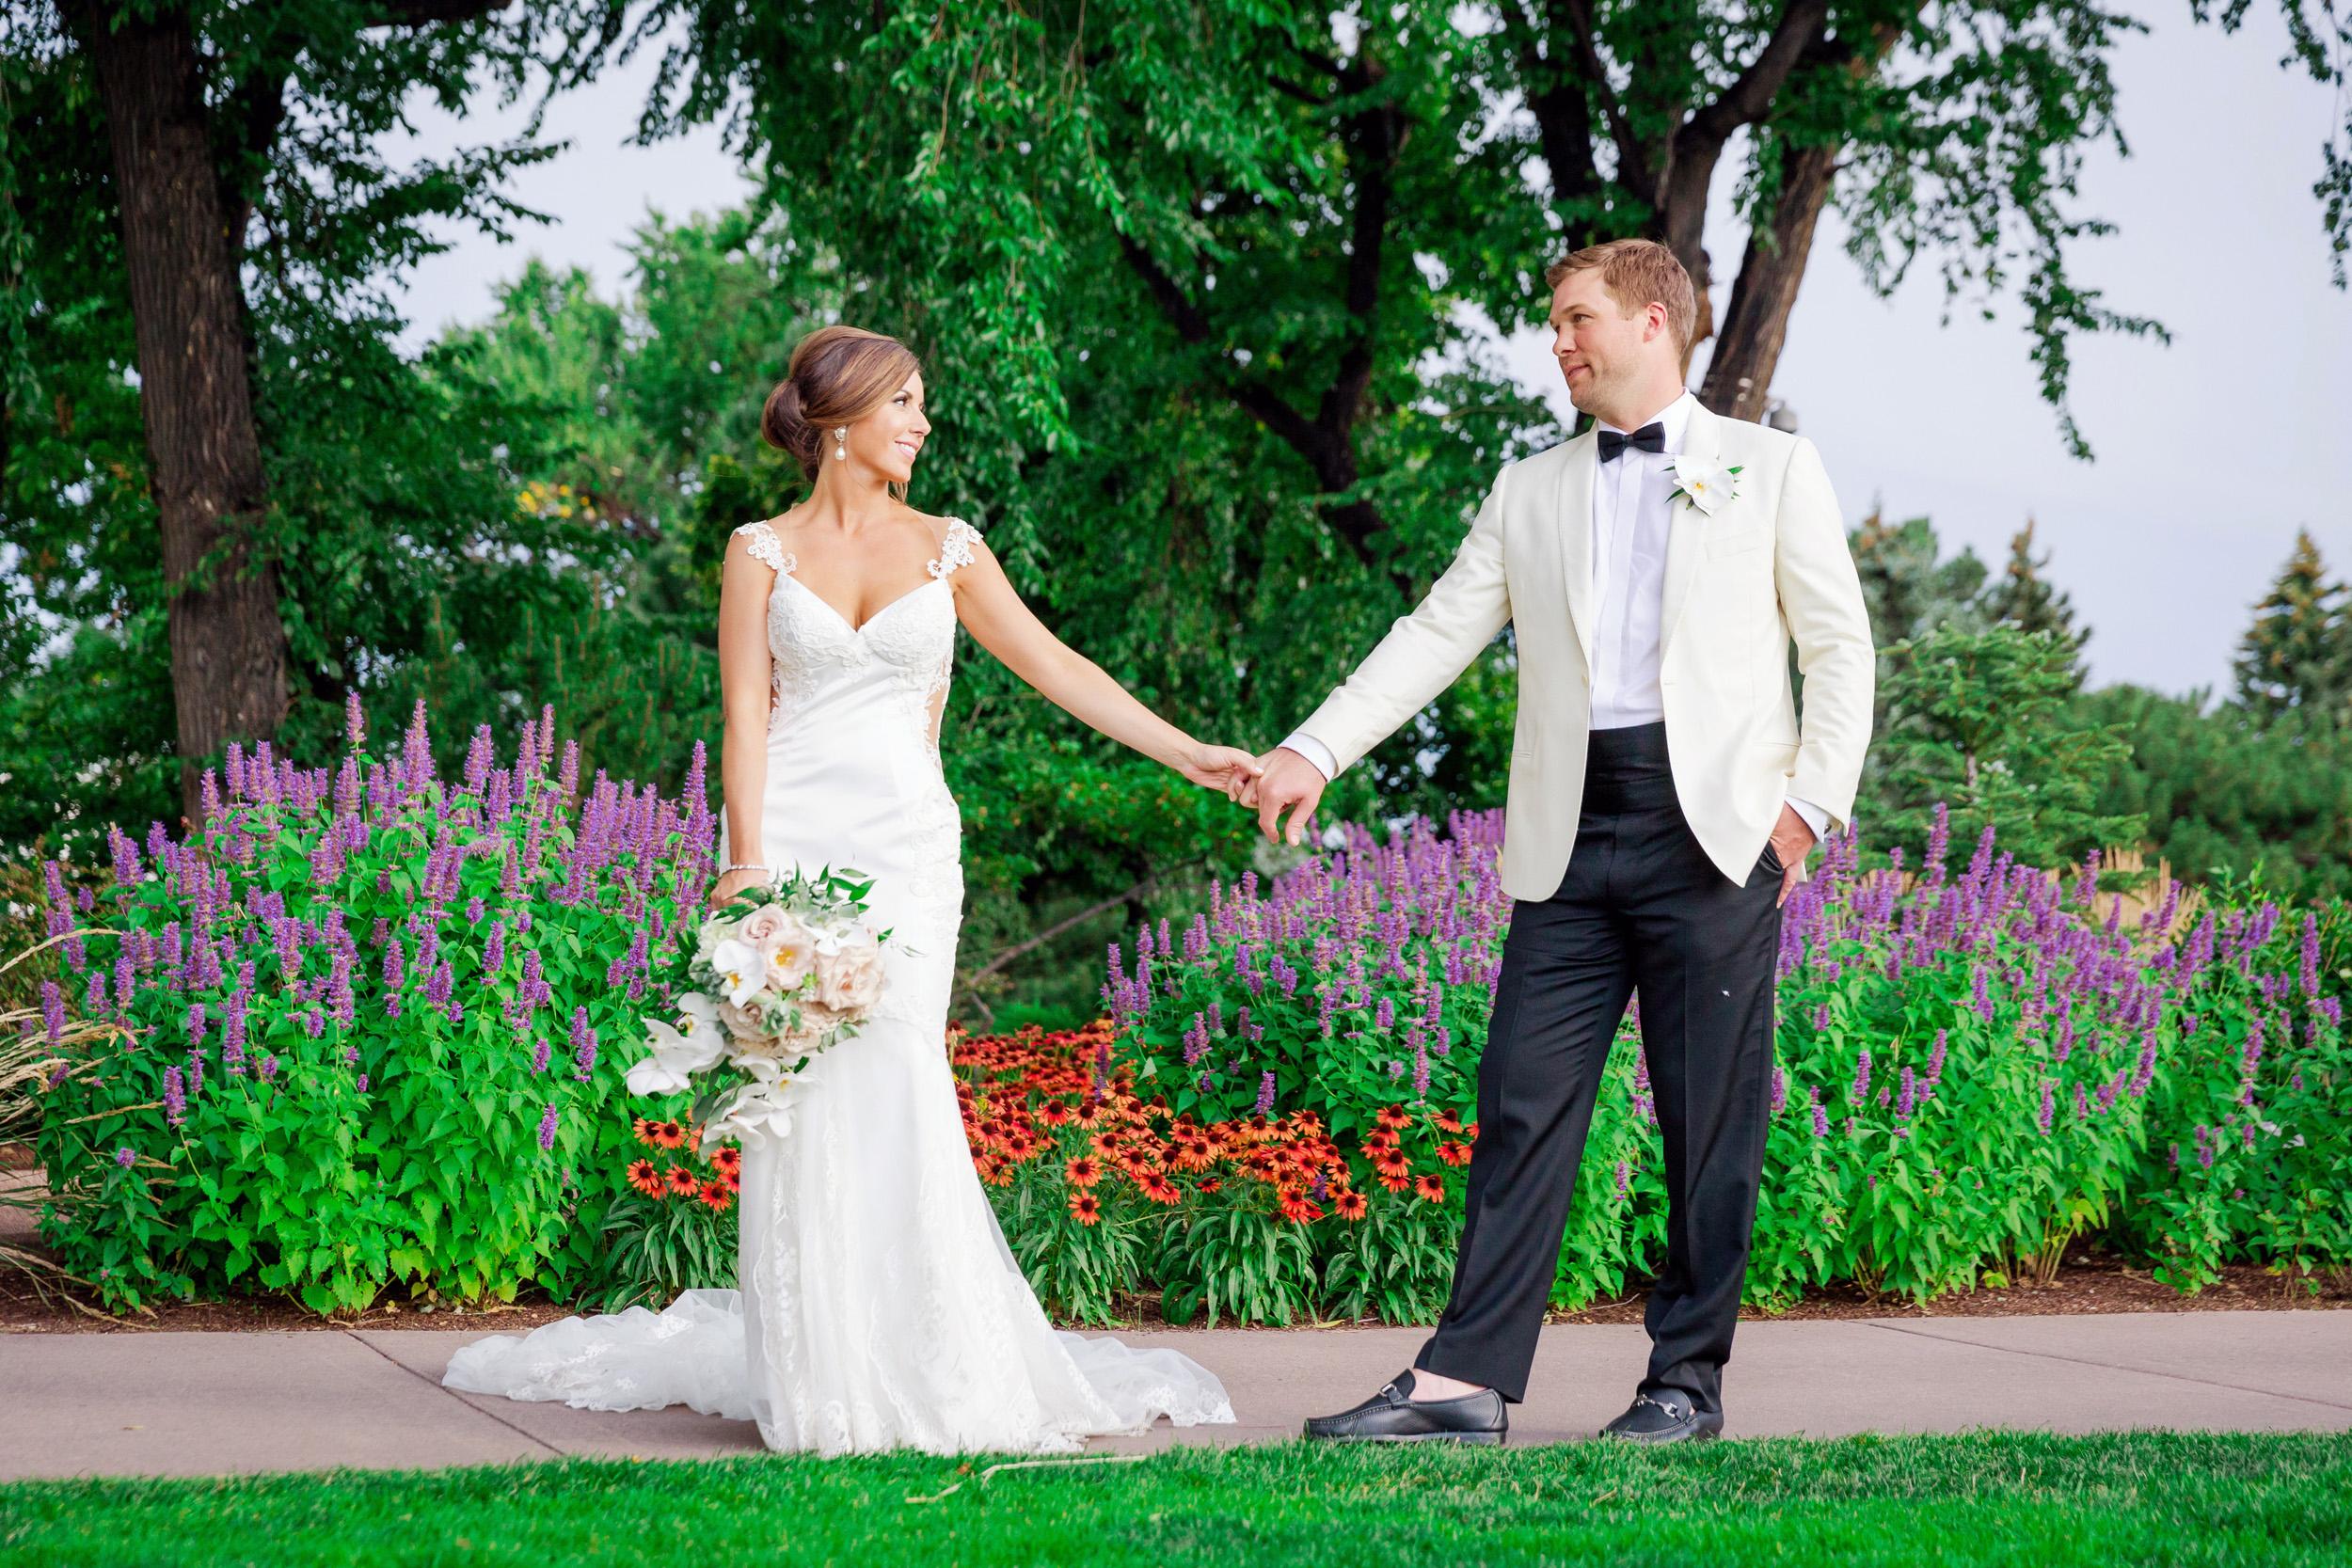 Colorado-Springs-Wedding-Photography-SS-001.jpg